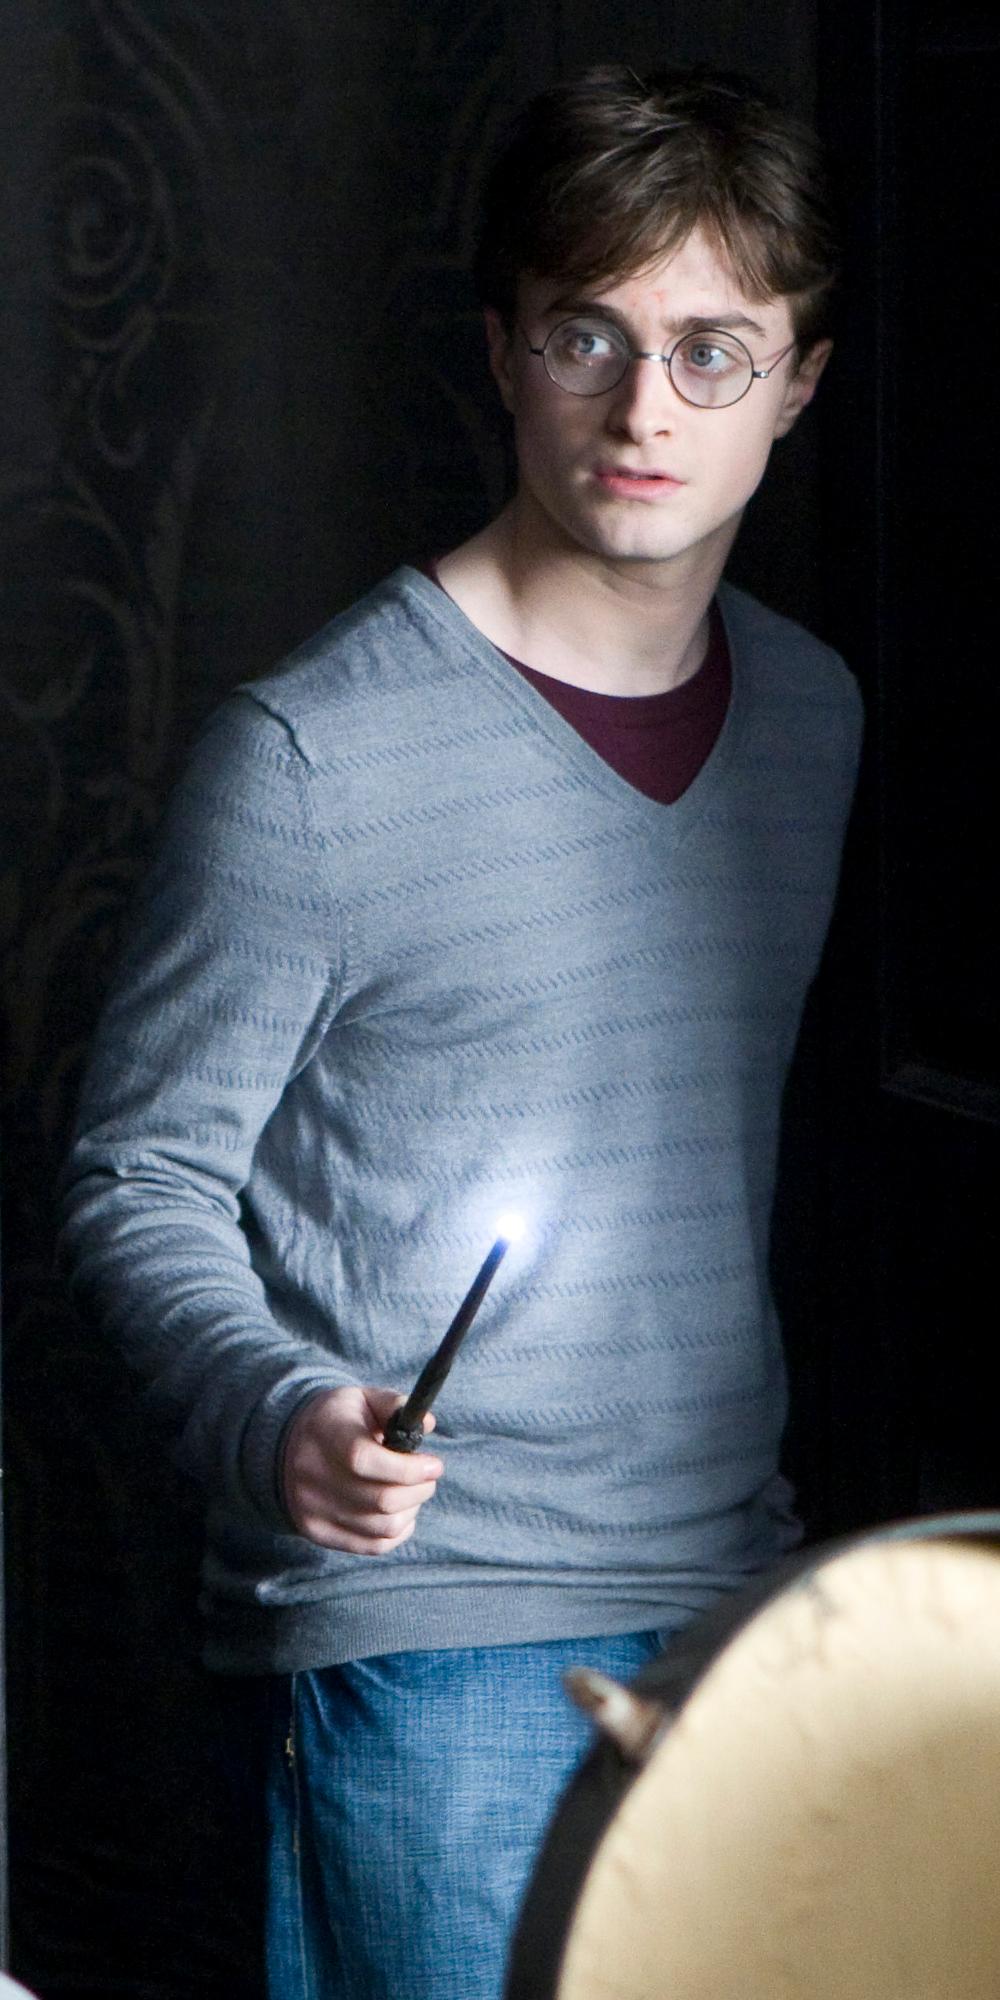 Harry Potter | Warner Bros. Entertainment Wiki | FANDOM ... - photo#15